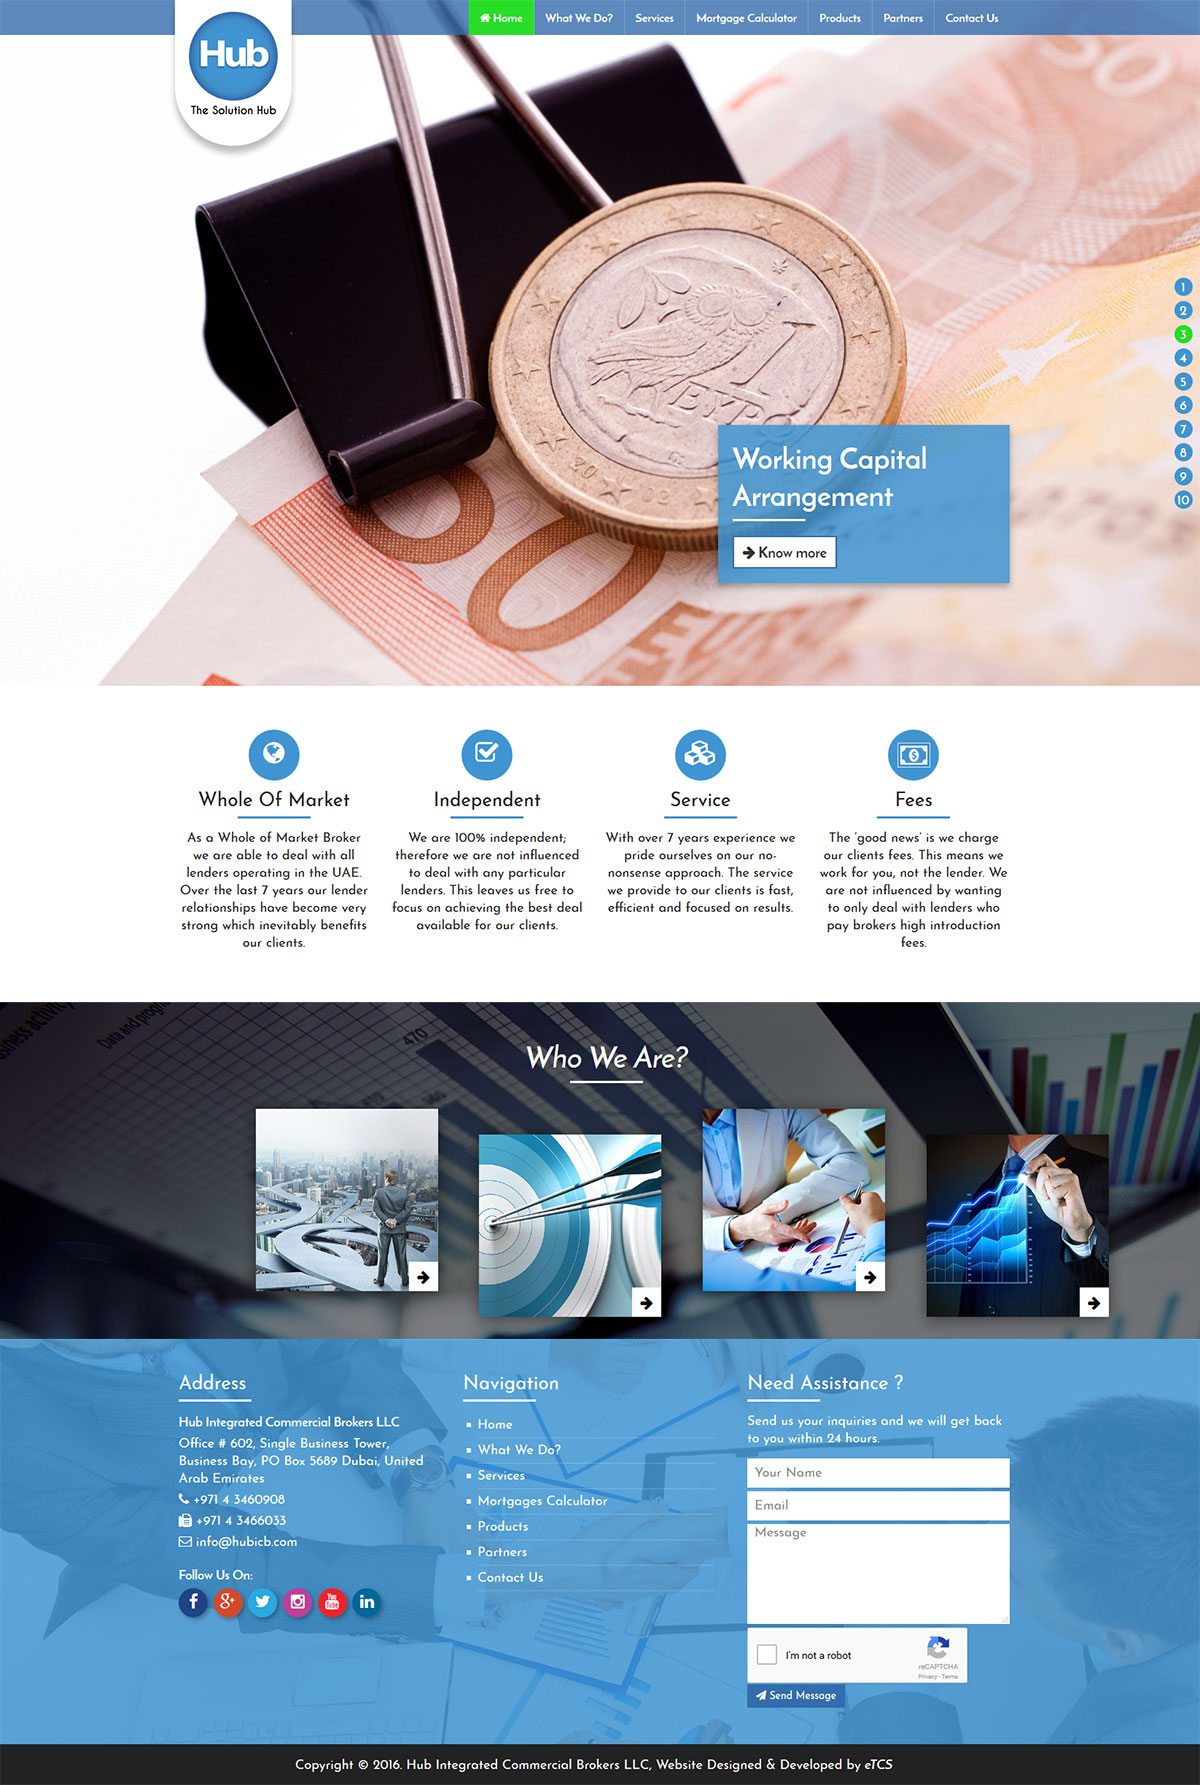 Hub Web Design (UI/UX)